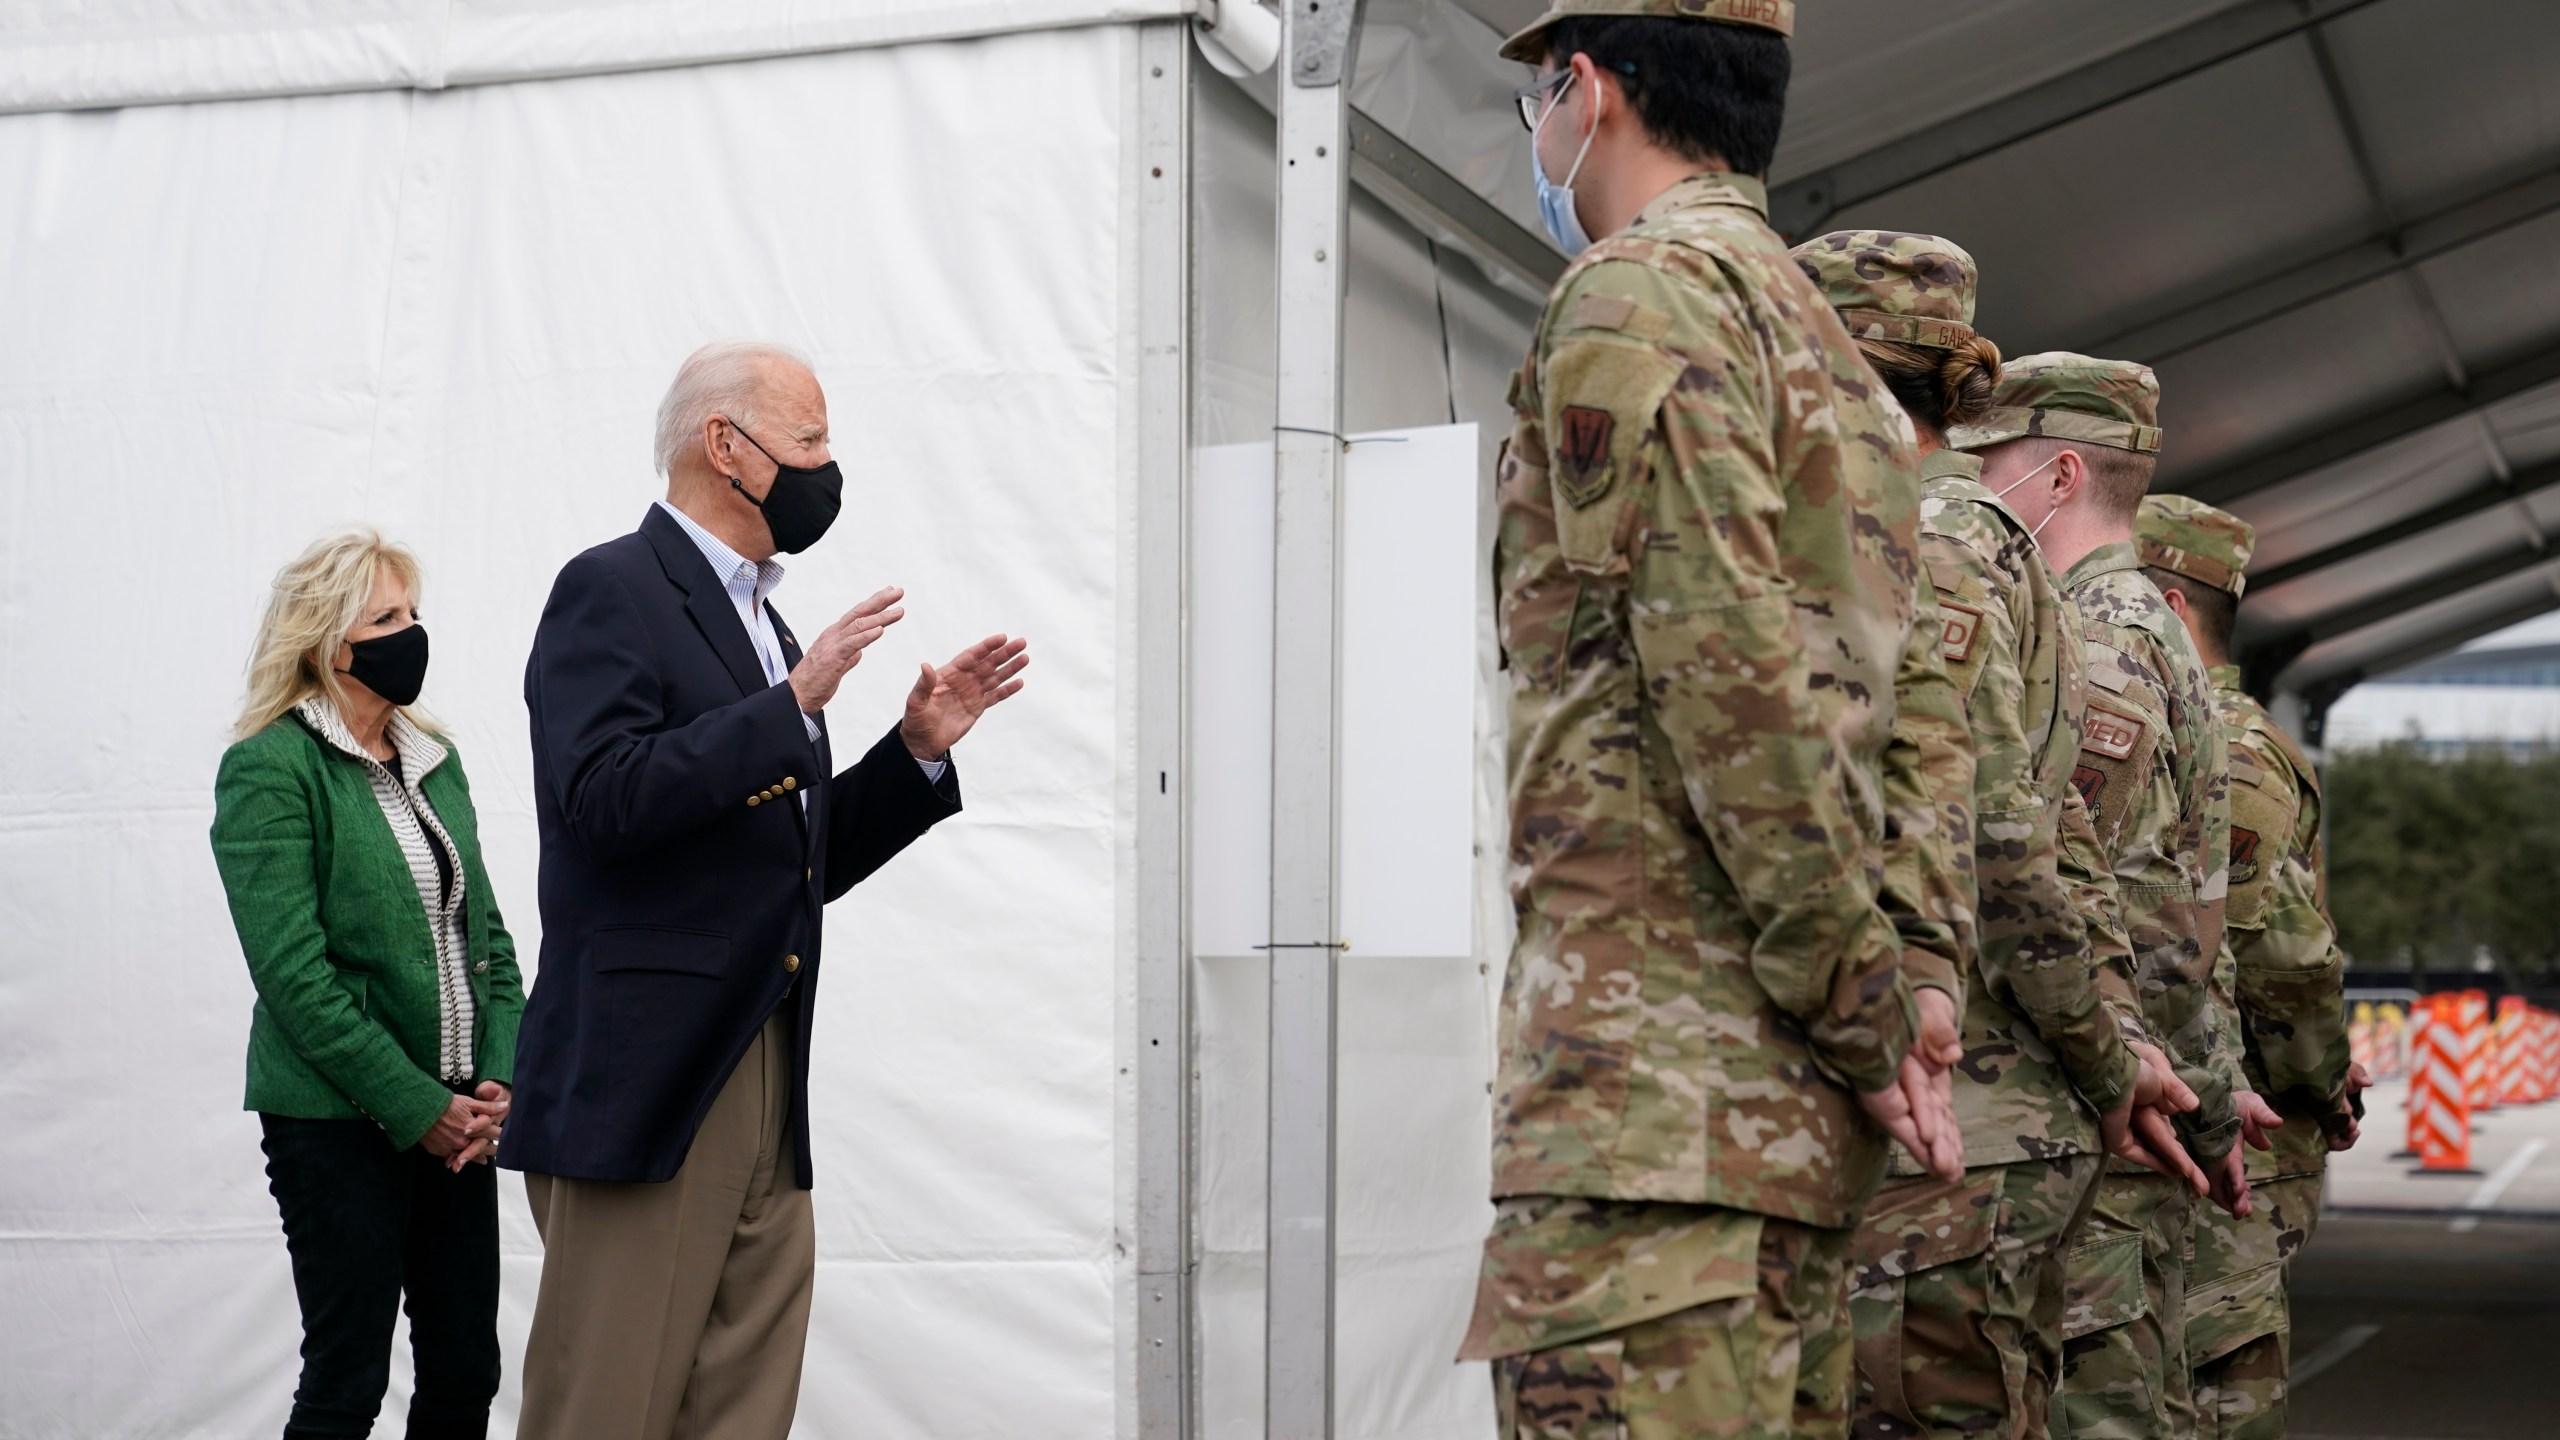 President Joe Biden and first lady Jill Biden meet with troops at a FEMA COVID-19 mass vaccination site at NRG Stadium, Friday, Feb. 26, 2021, in Houston. (AP Photo/Patrick Semansky)